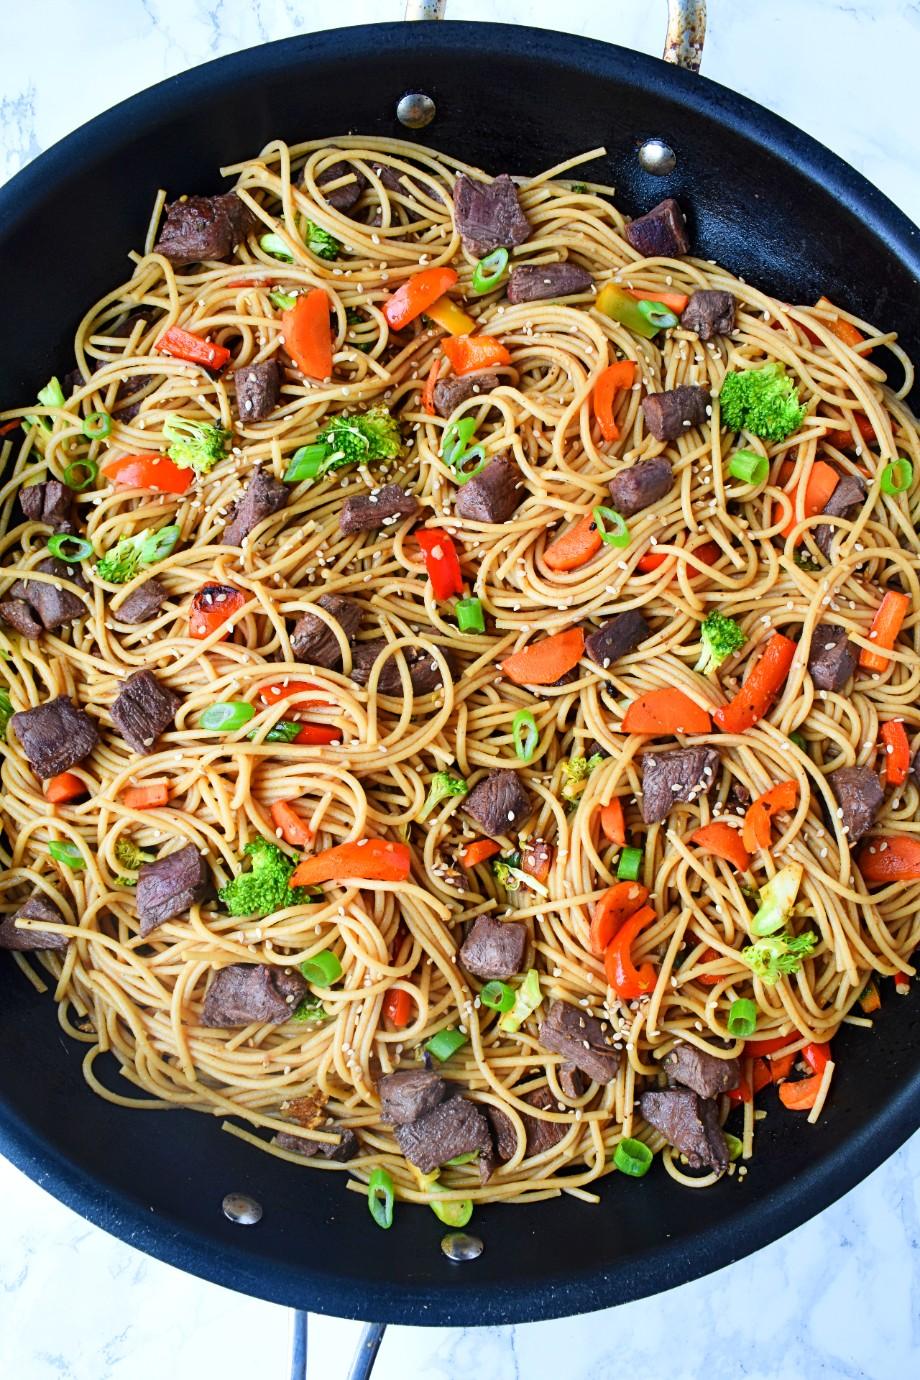 Pan of Beef Stir Fry Noodles